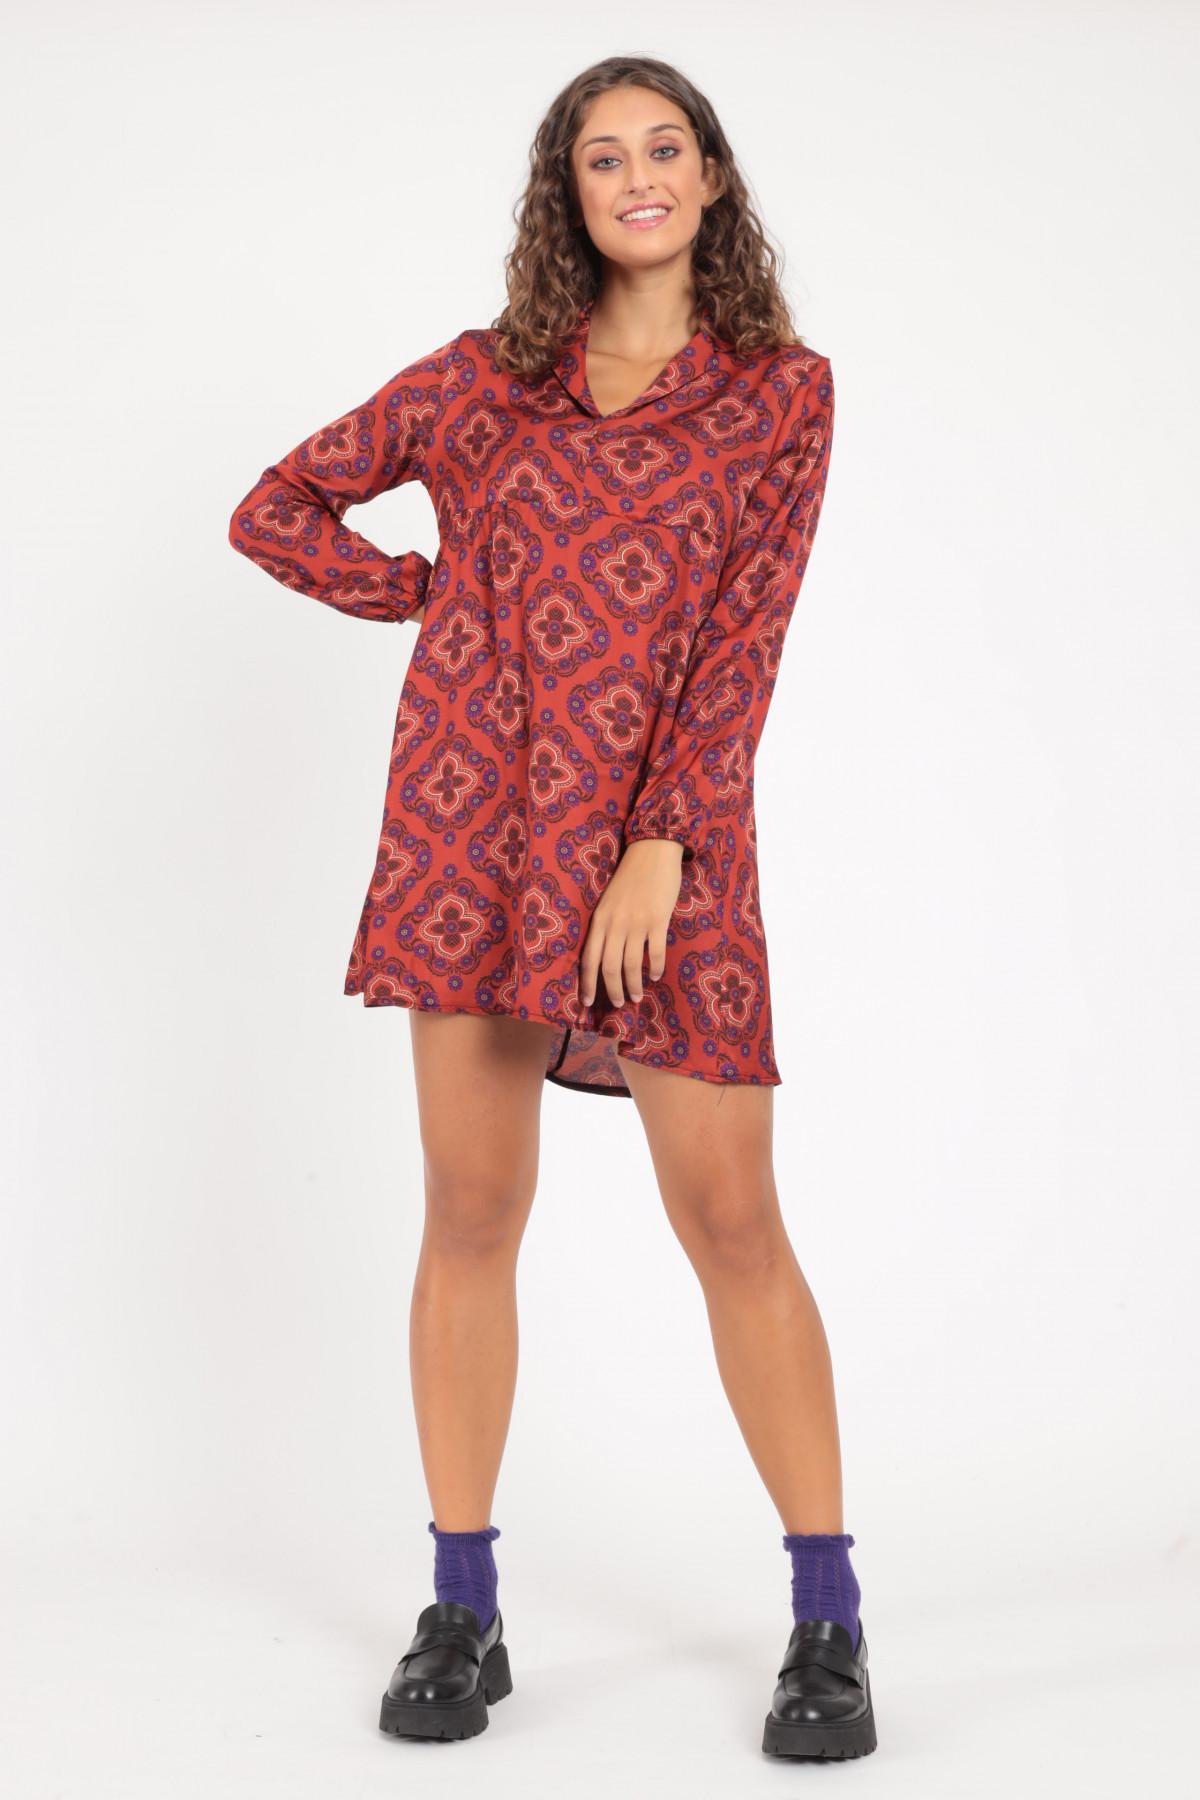 Short Long Sleeve Dress in Floral Fantasy Print